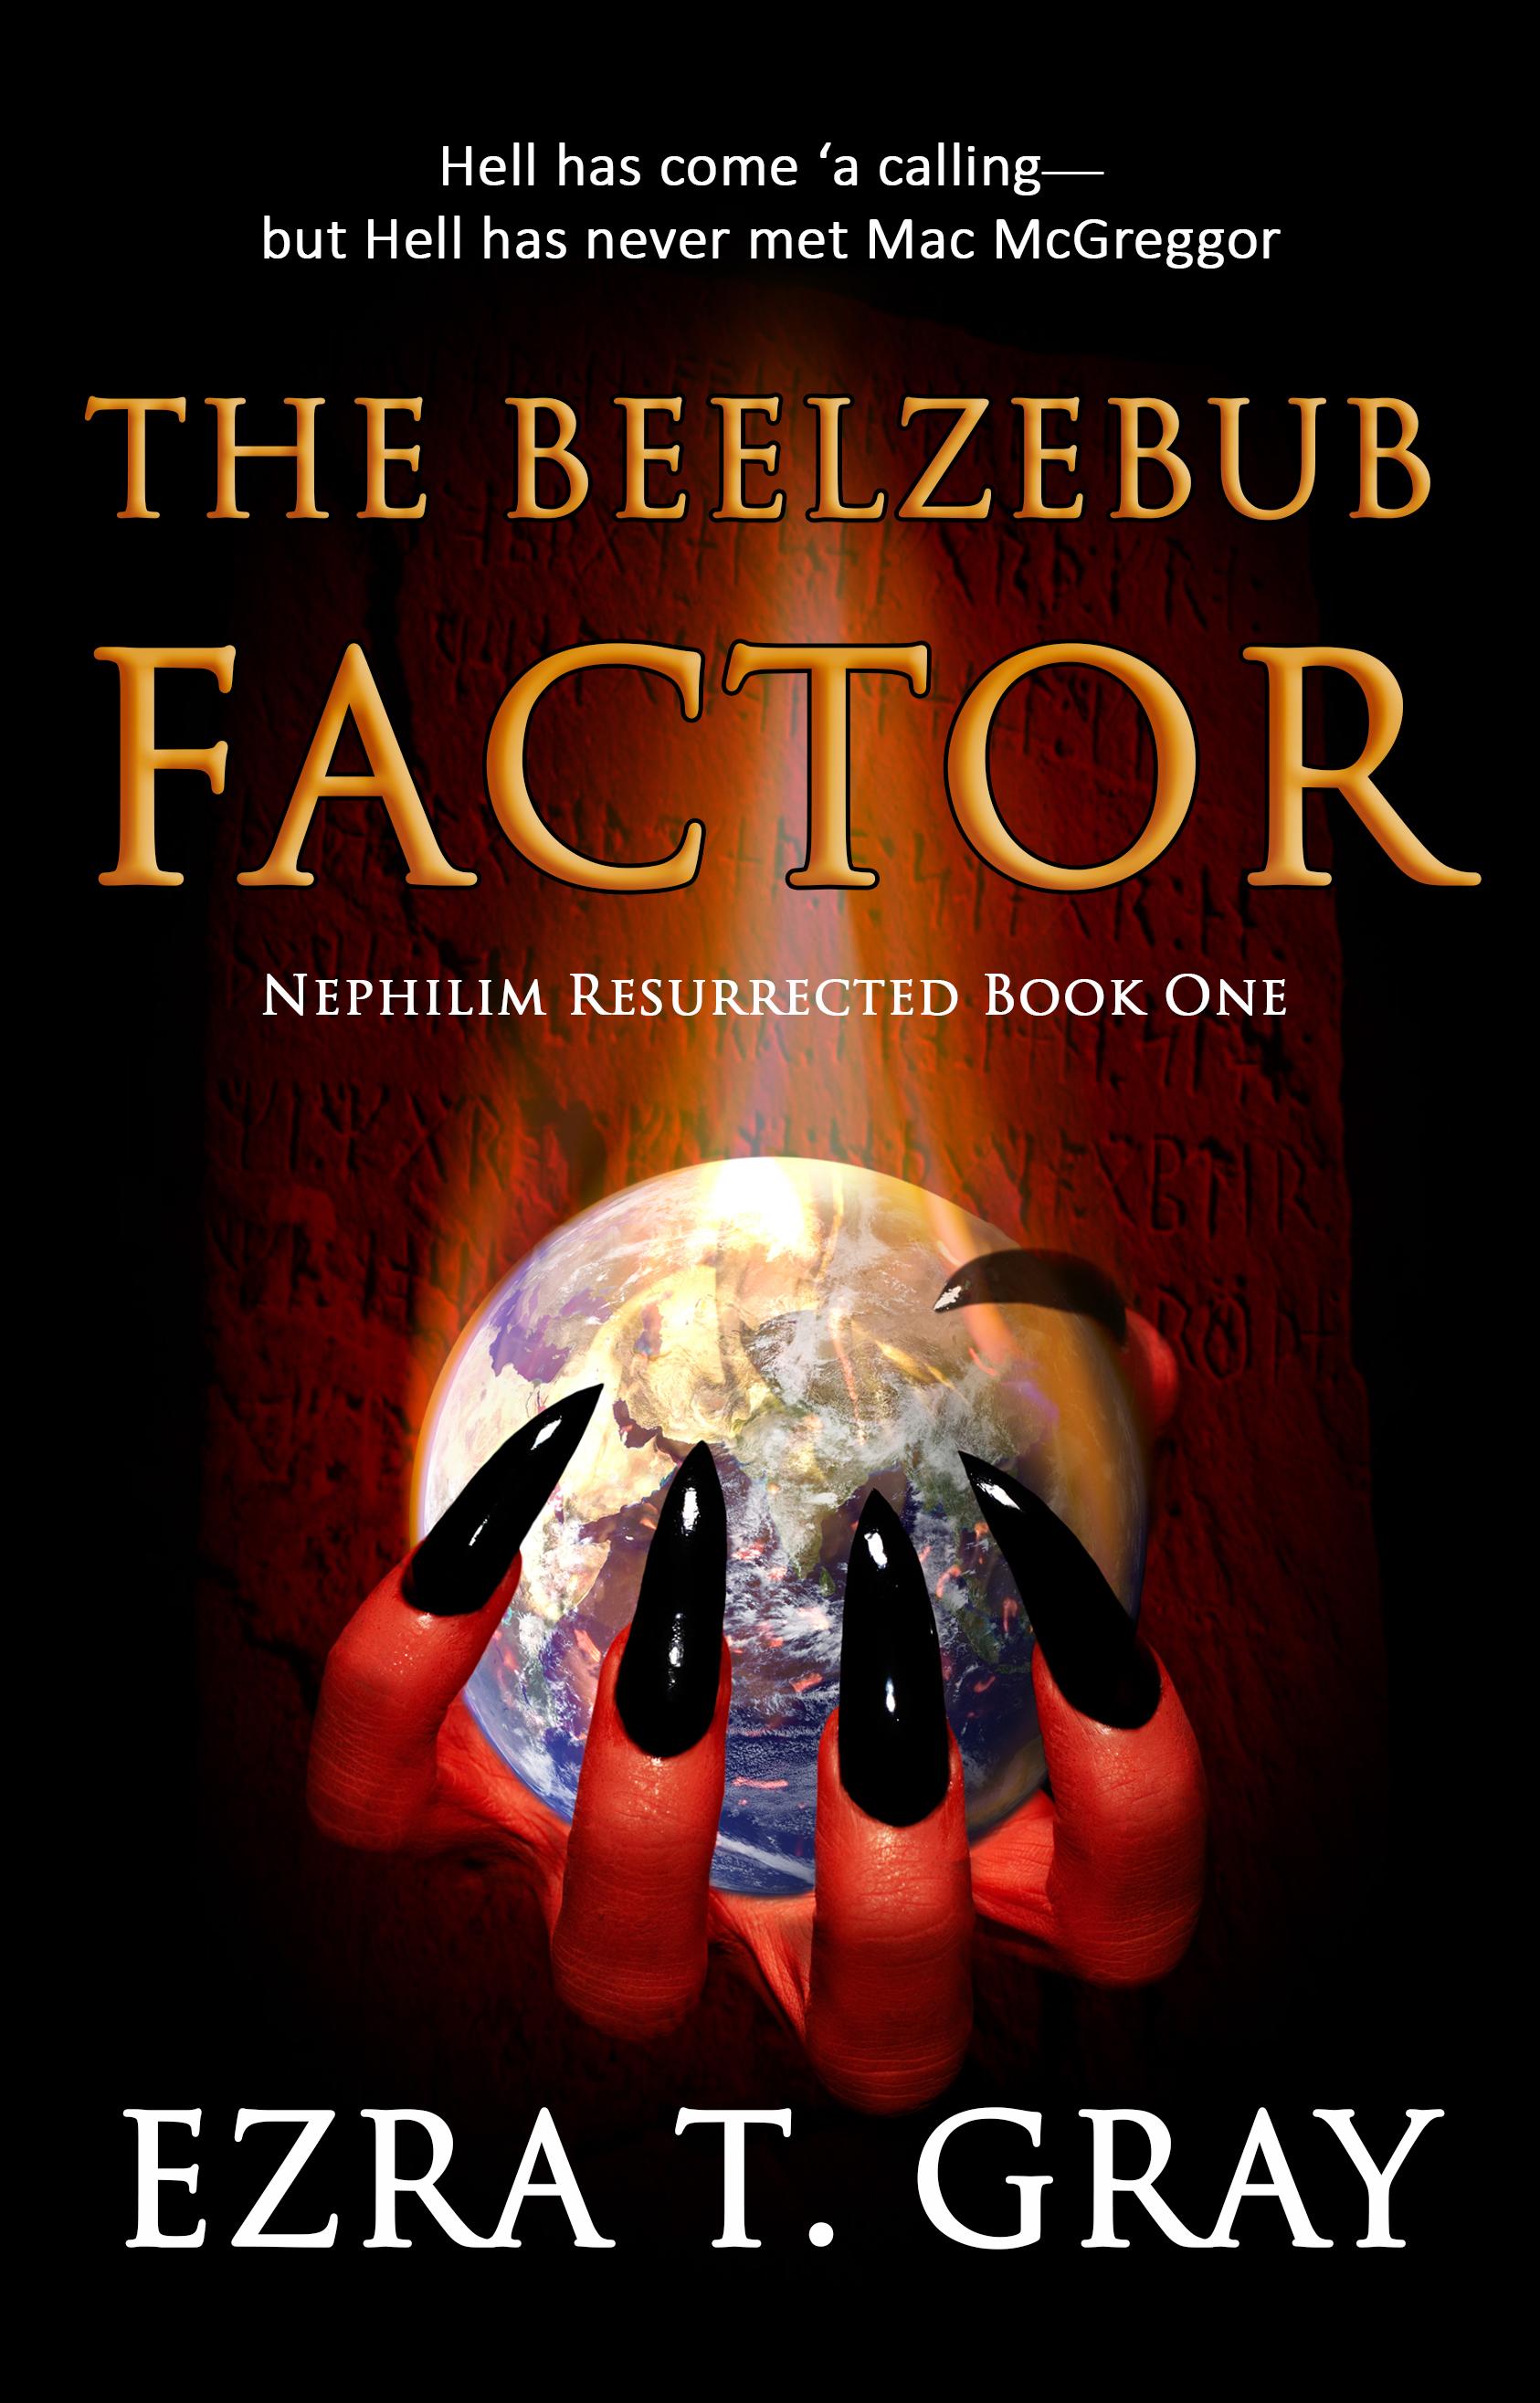 Nephilim Resurrected: The Beelzebub Factor